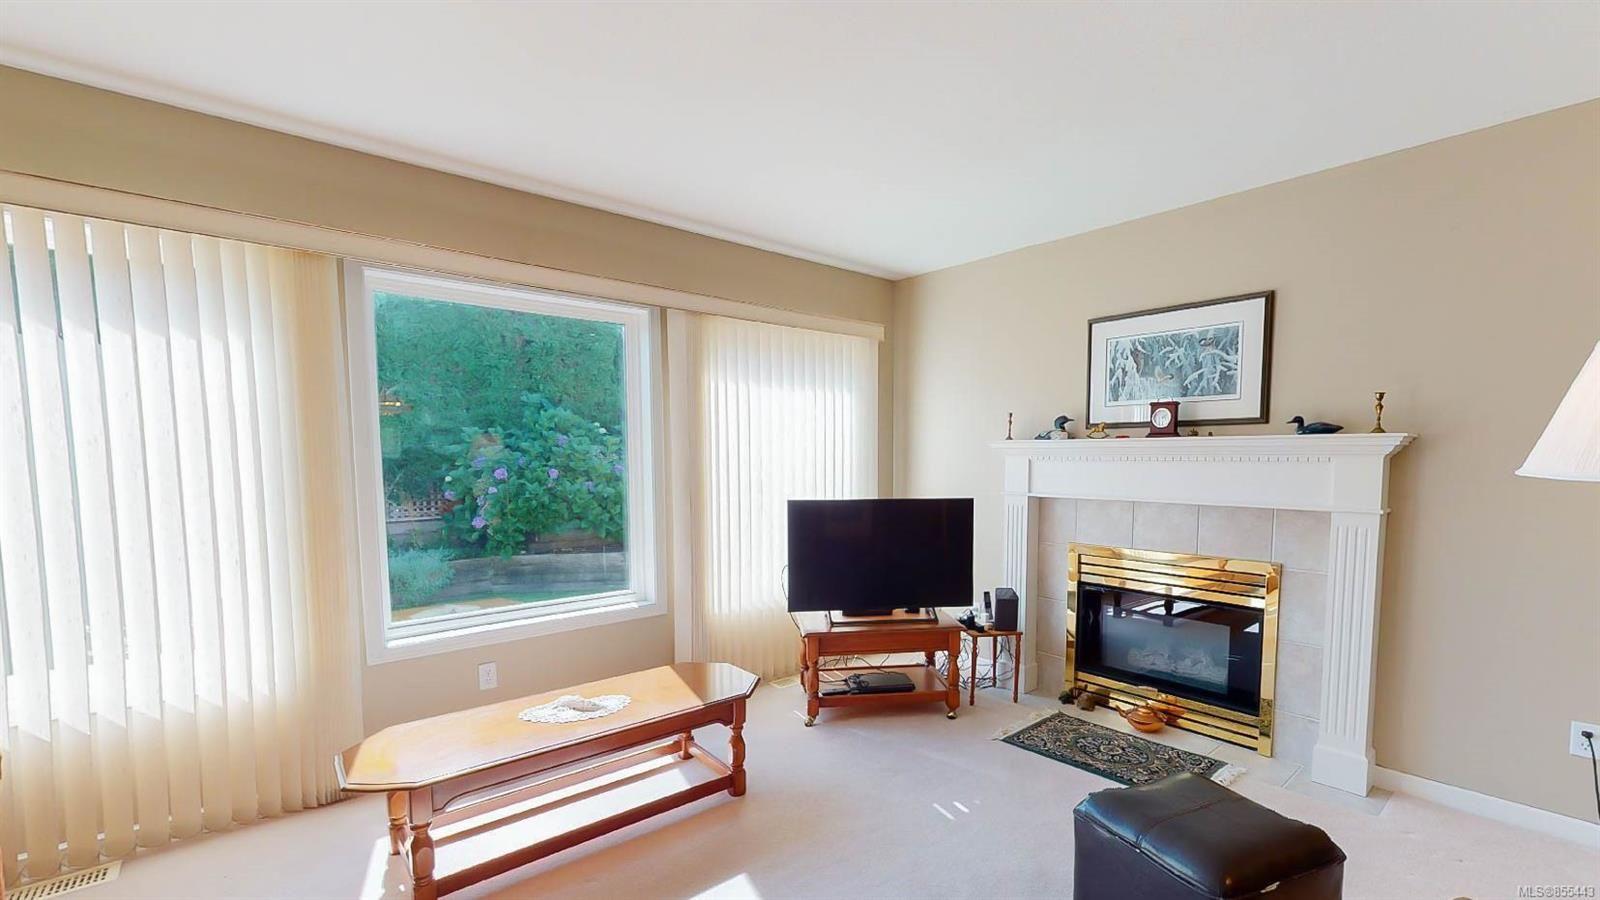 Photo 4: Photos: 1294 Leeward Way in : PQ Qualicum Beach House for sale (Parksville/Qualicum)  : MLS®# 855443